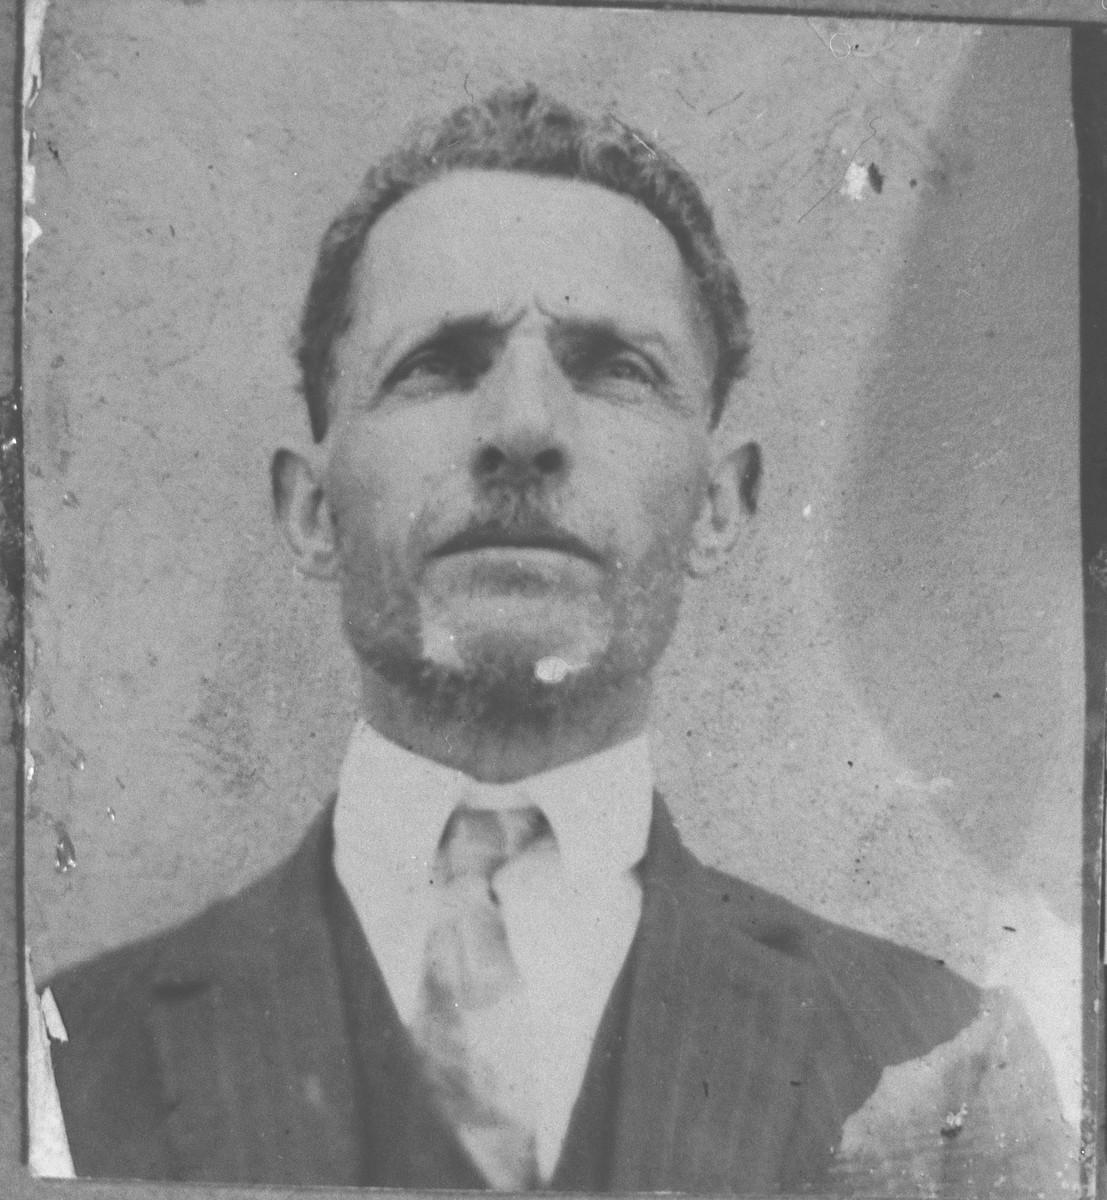 Portrait of Samuel Shozari.